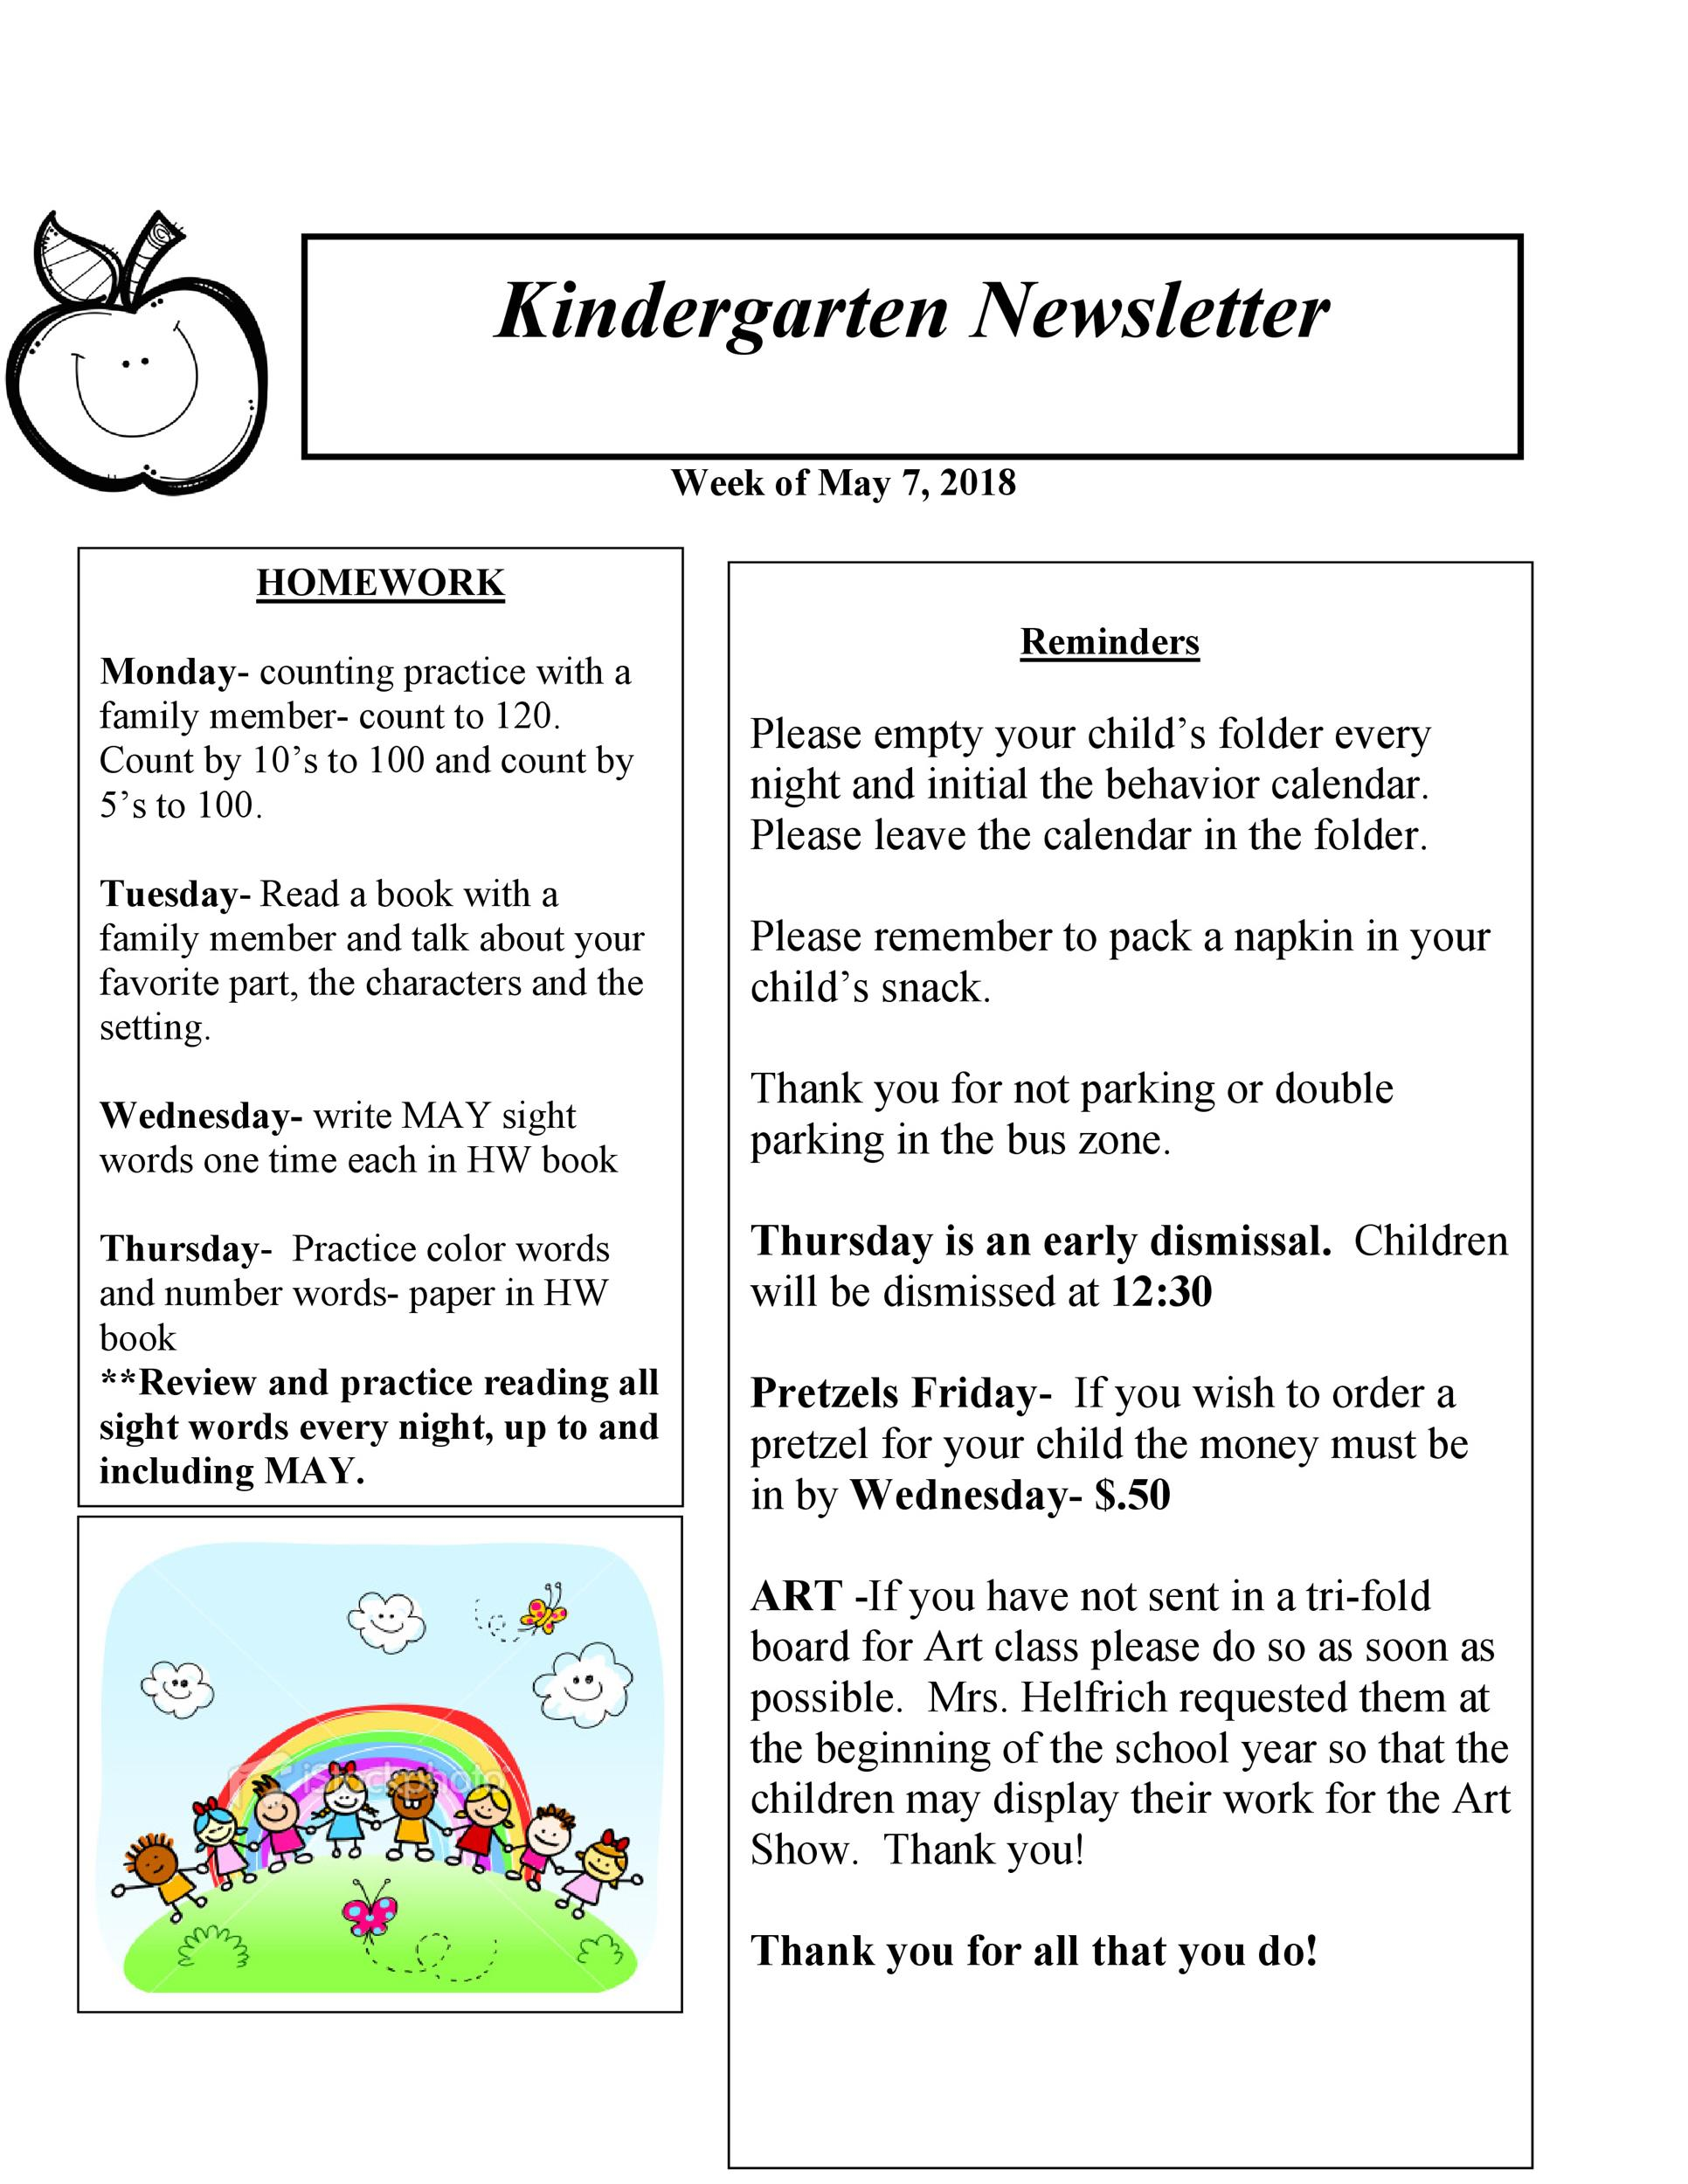 Free preschool newsletter template 16